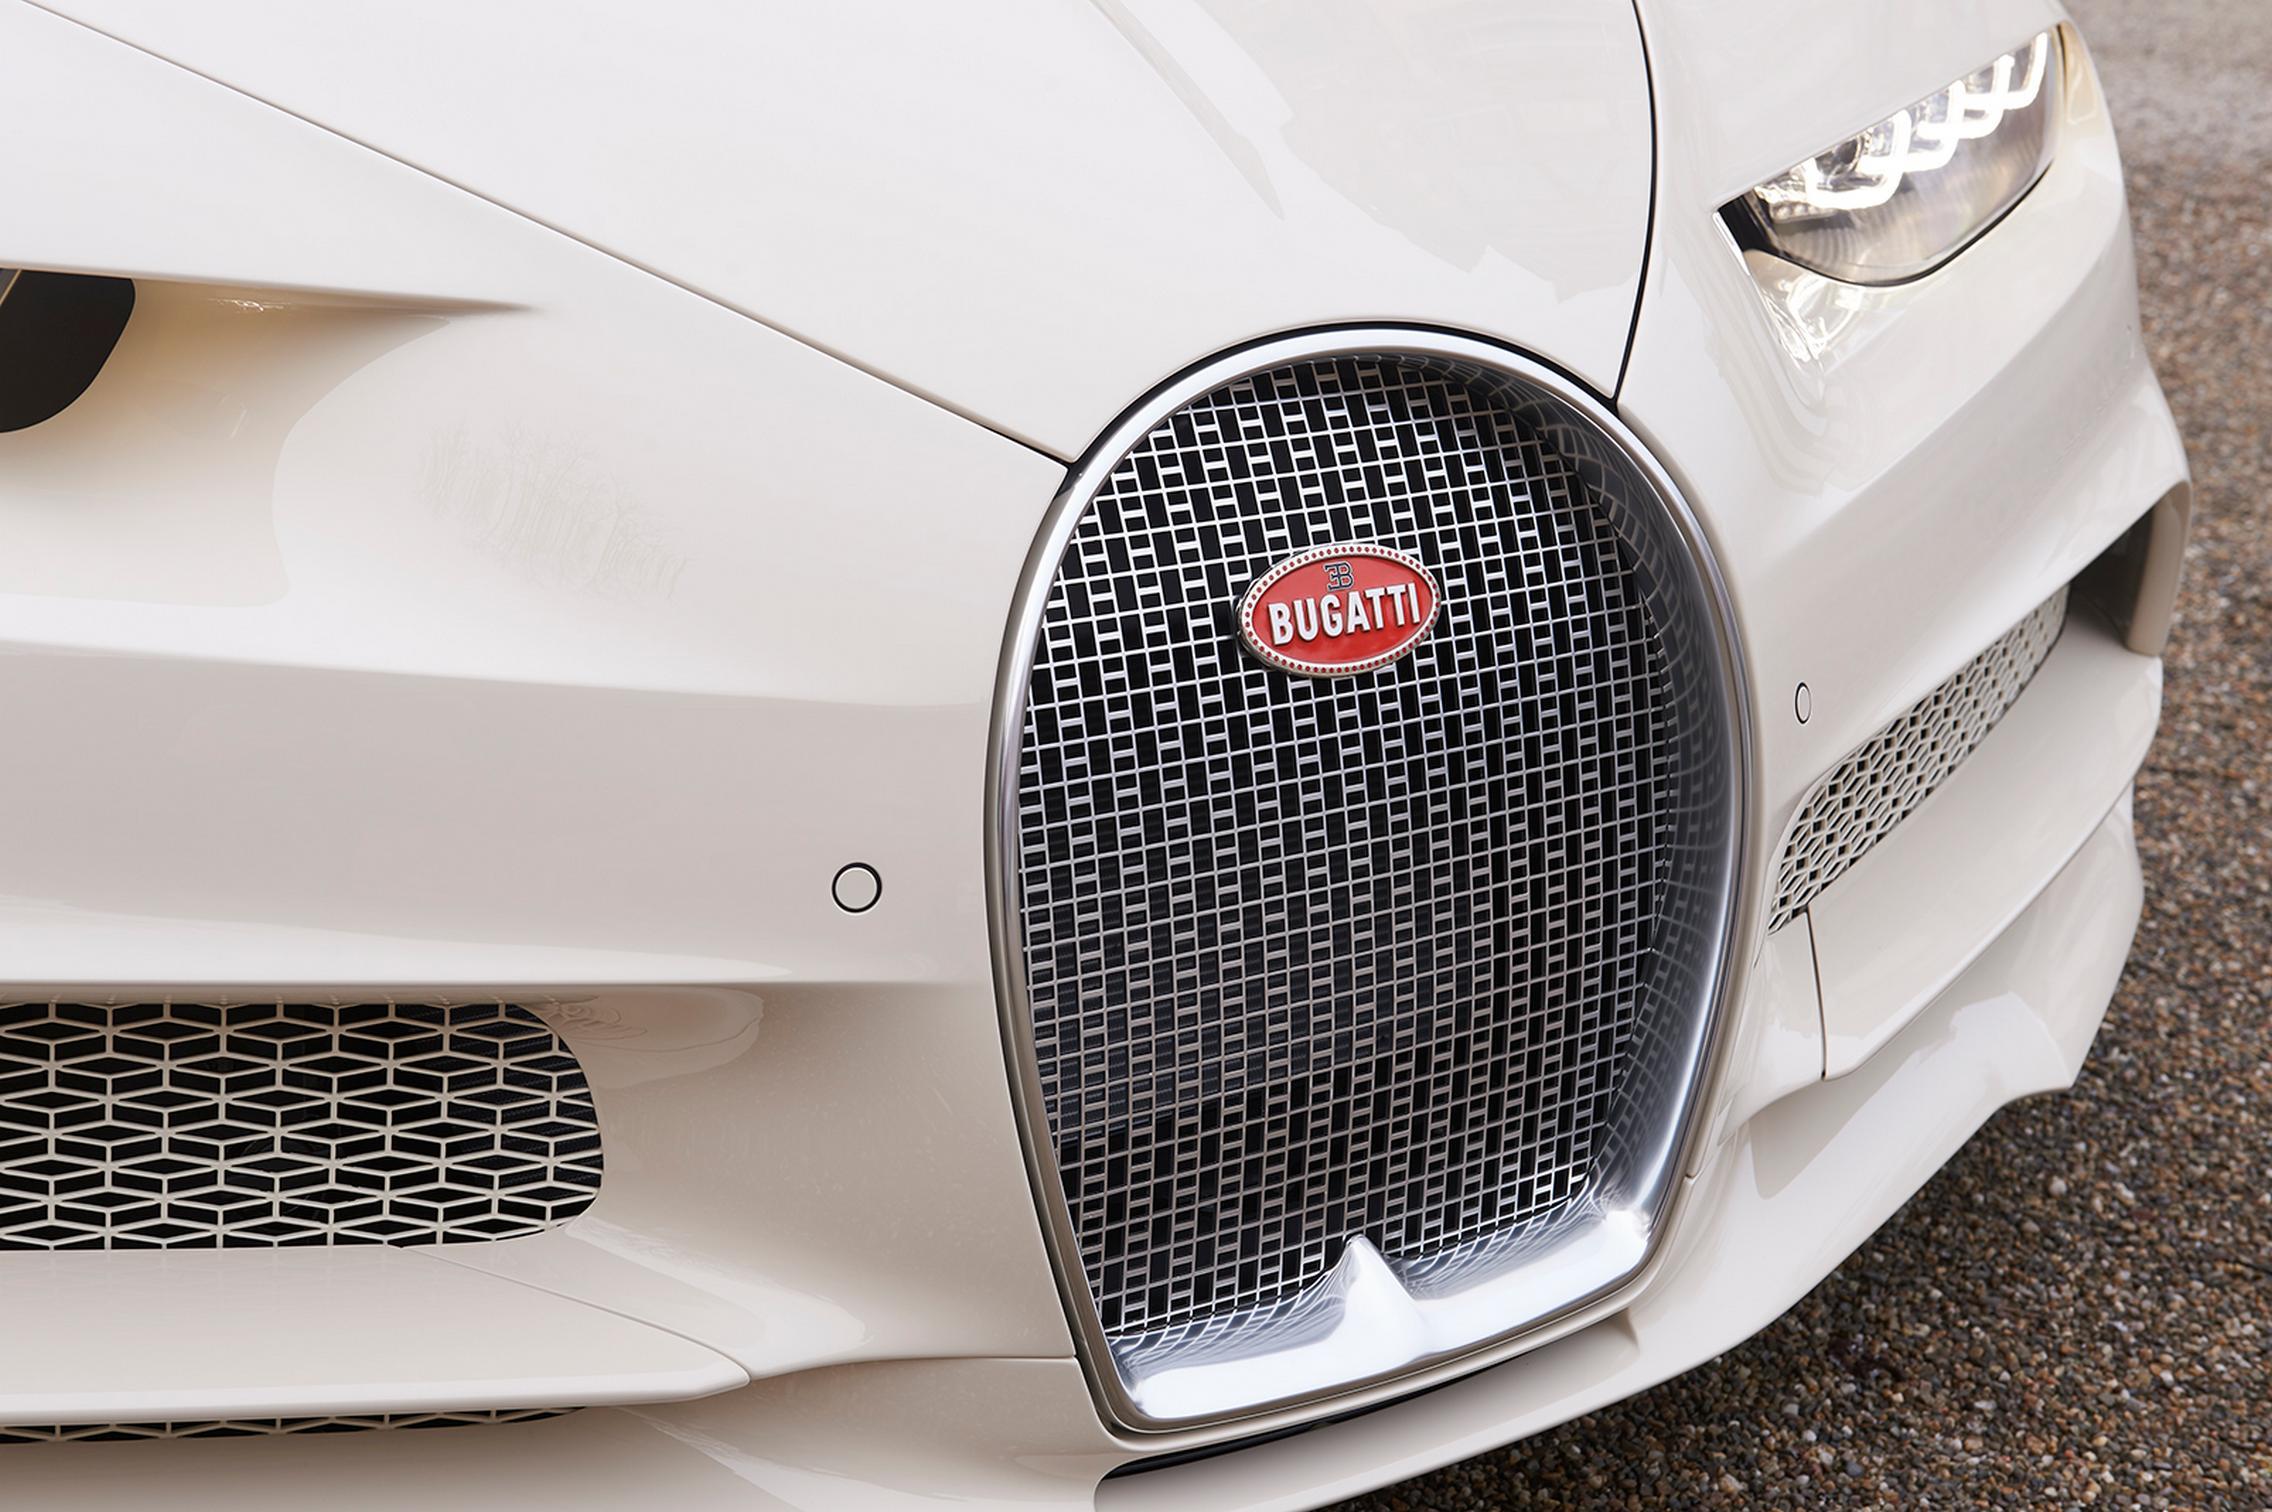 Hermes Bugatti Chiron grille